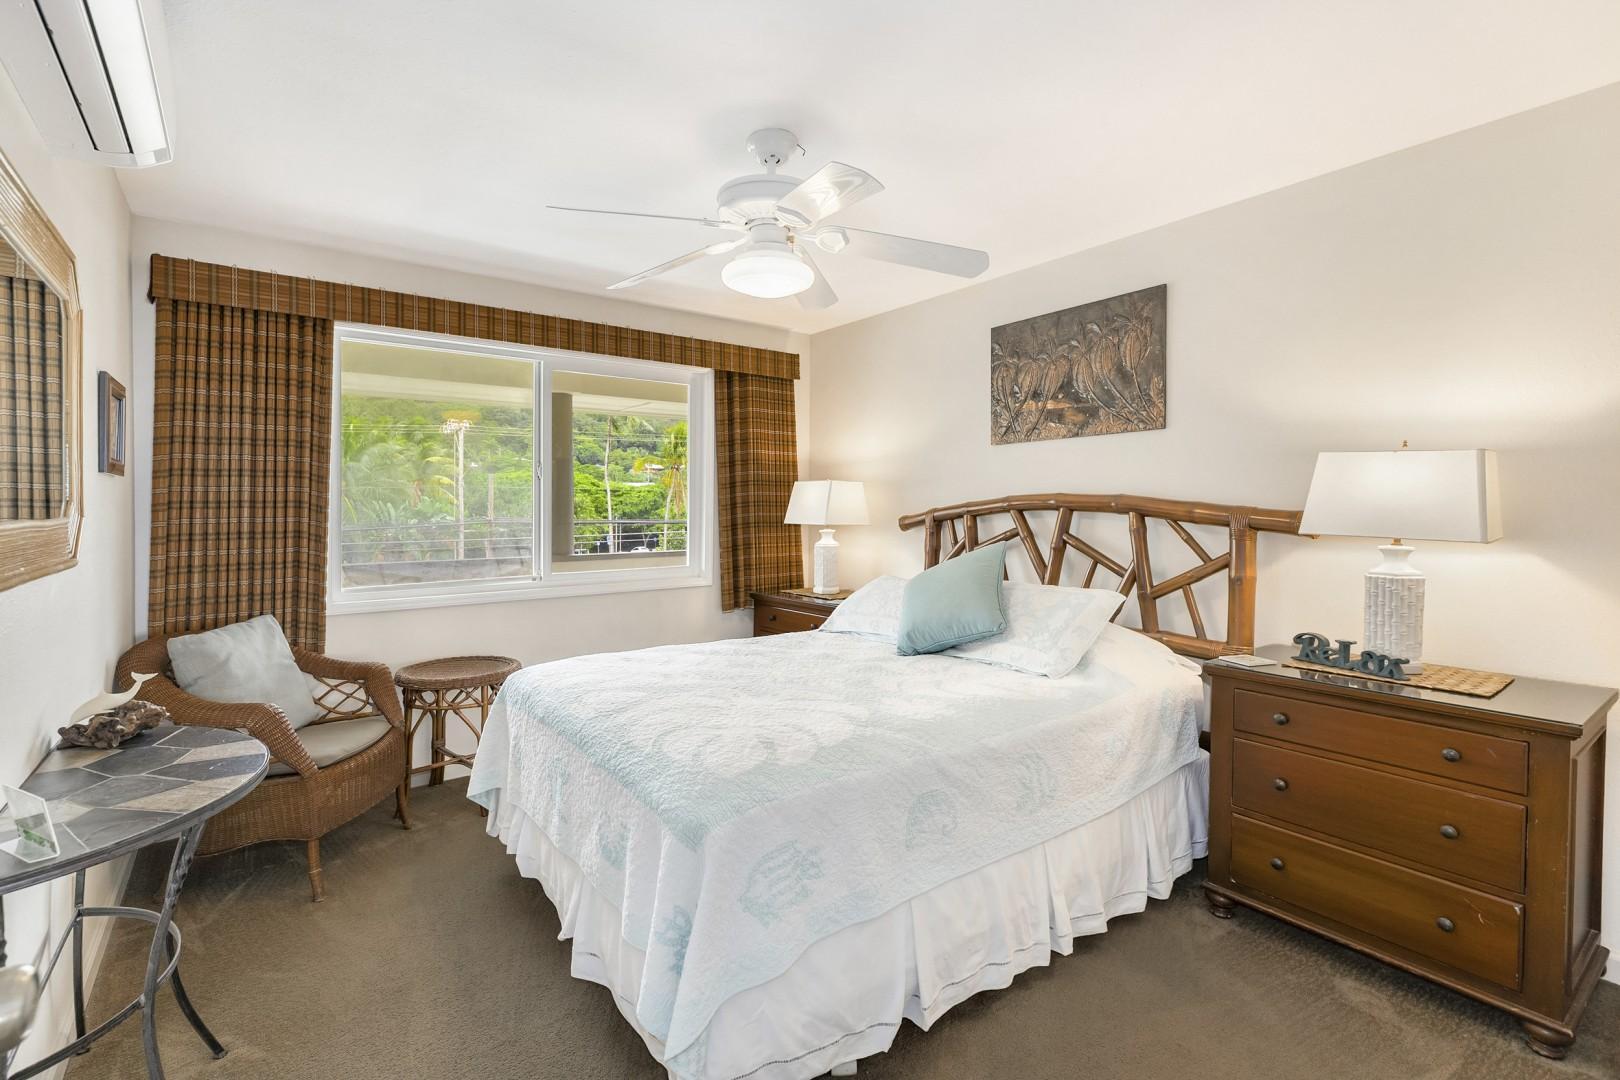 Guest bedroom with split ac, fan, dresser, and queen bed.